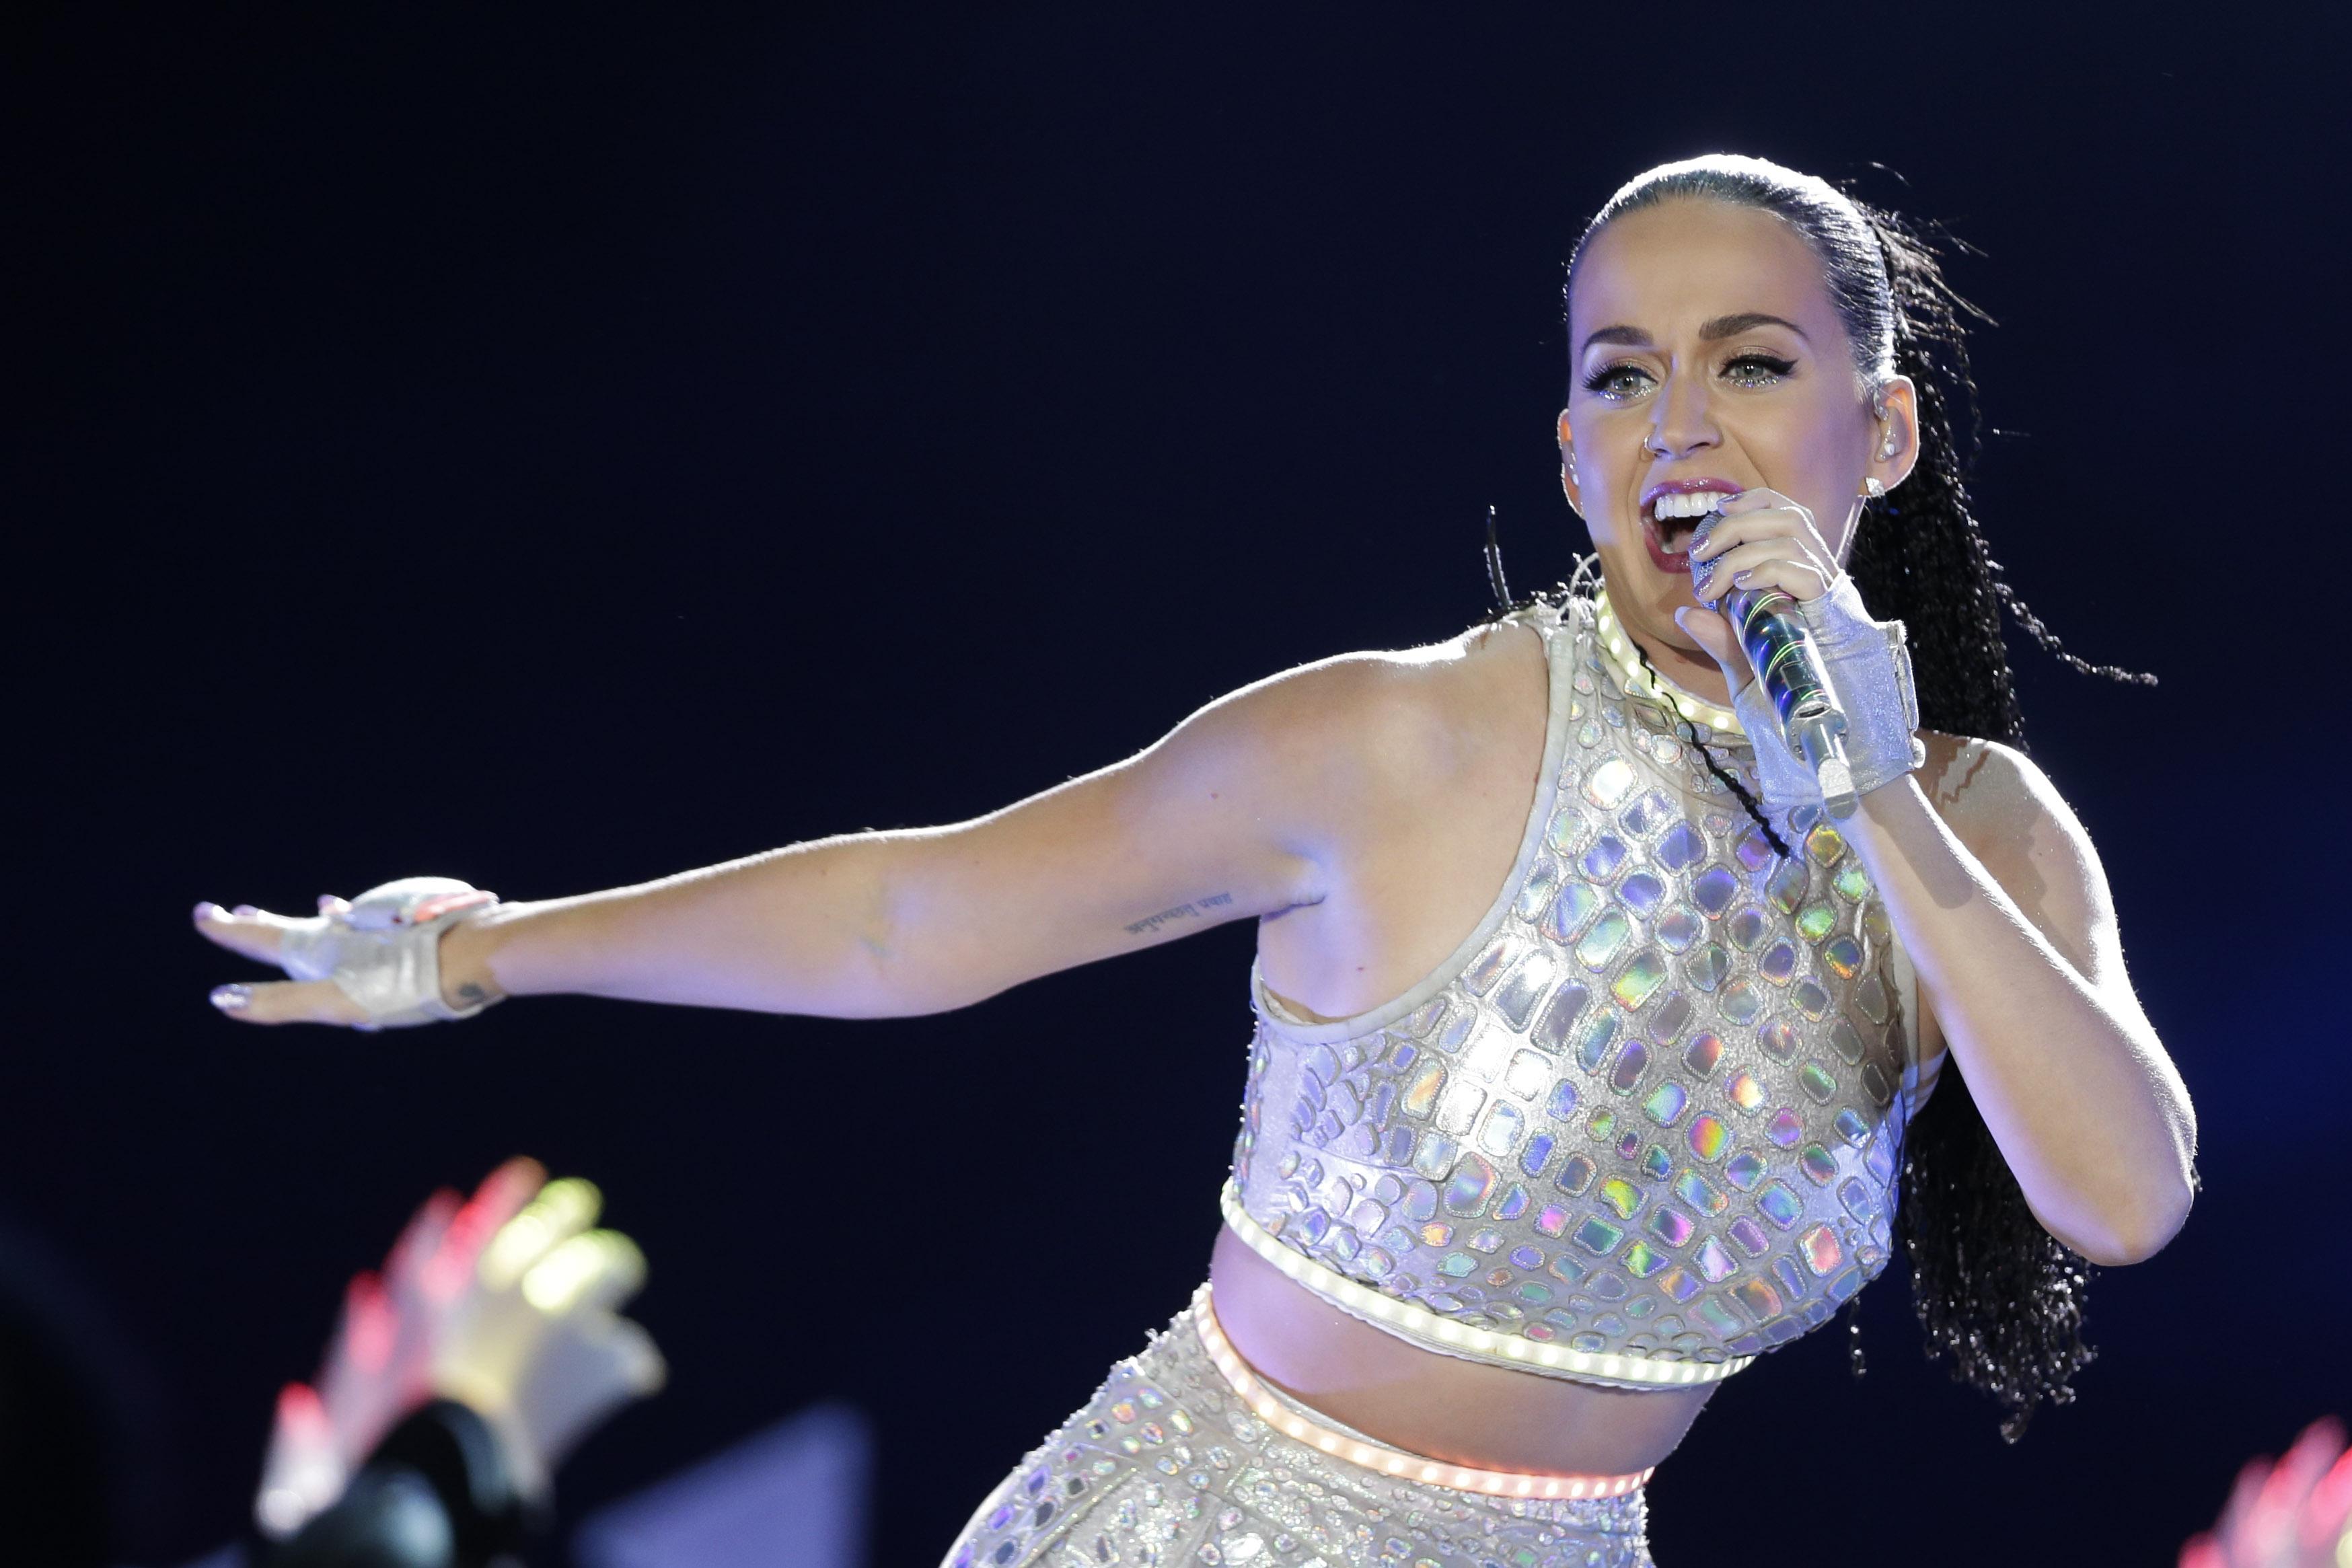 Katy Perry performs at the Rock in Rio music festival in Rio de Janeiro, Brazil, Monday, Sept. 28, 2015.